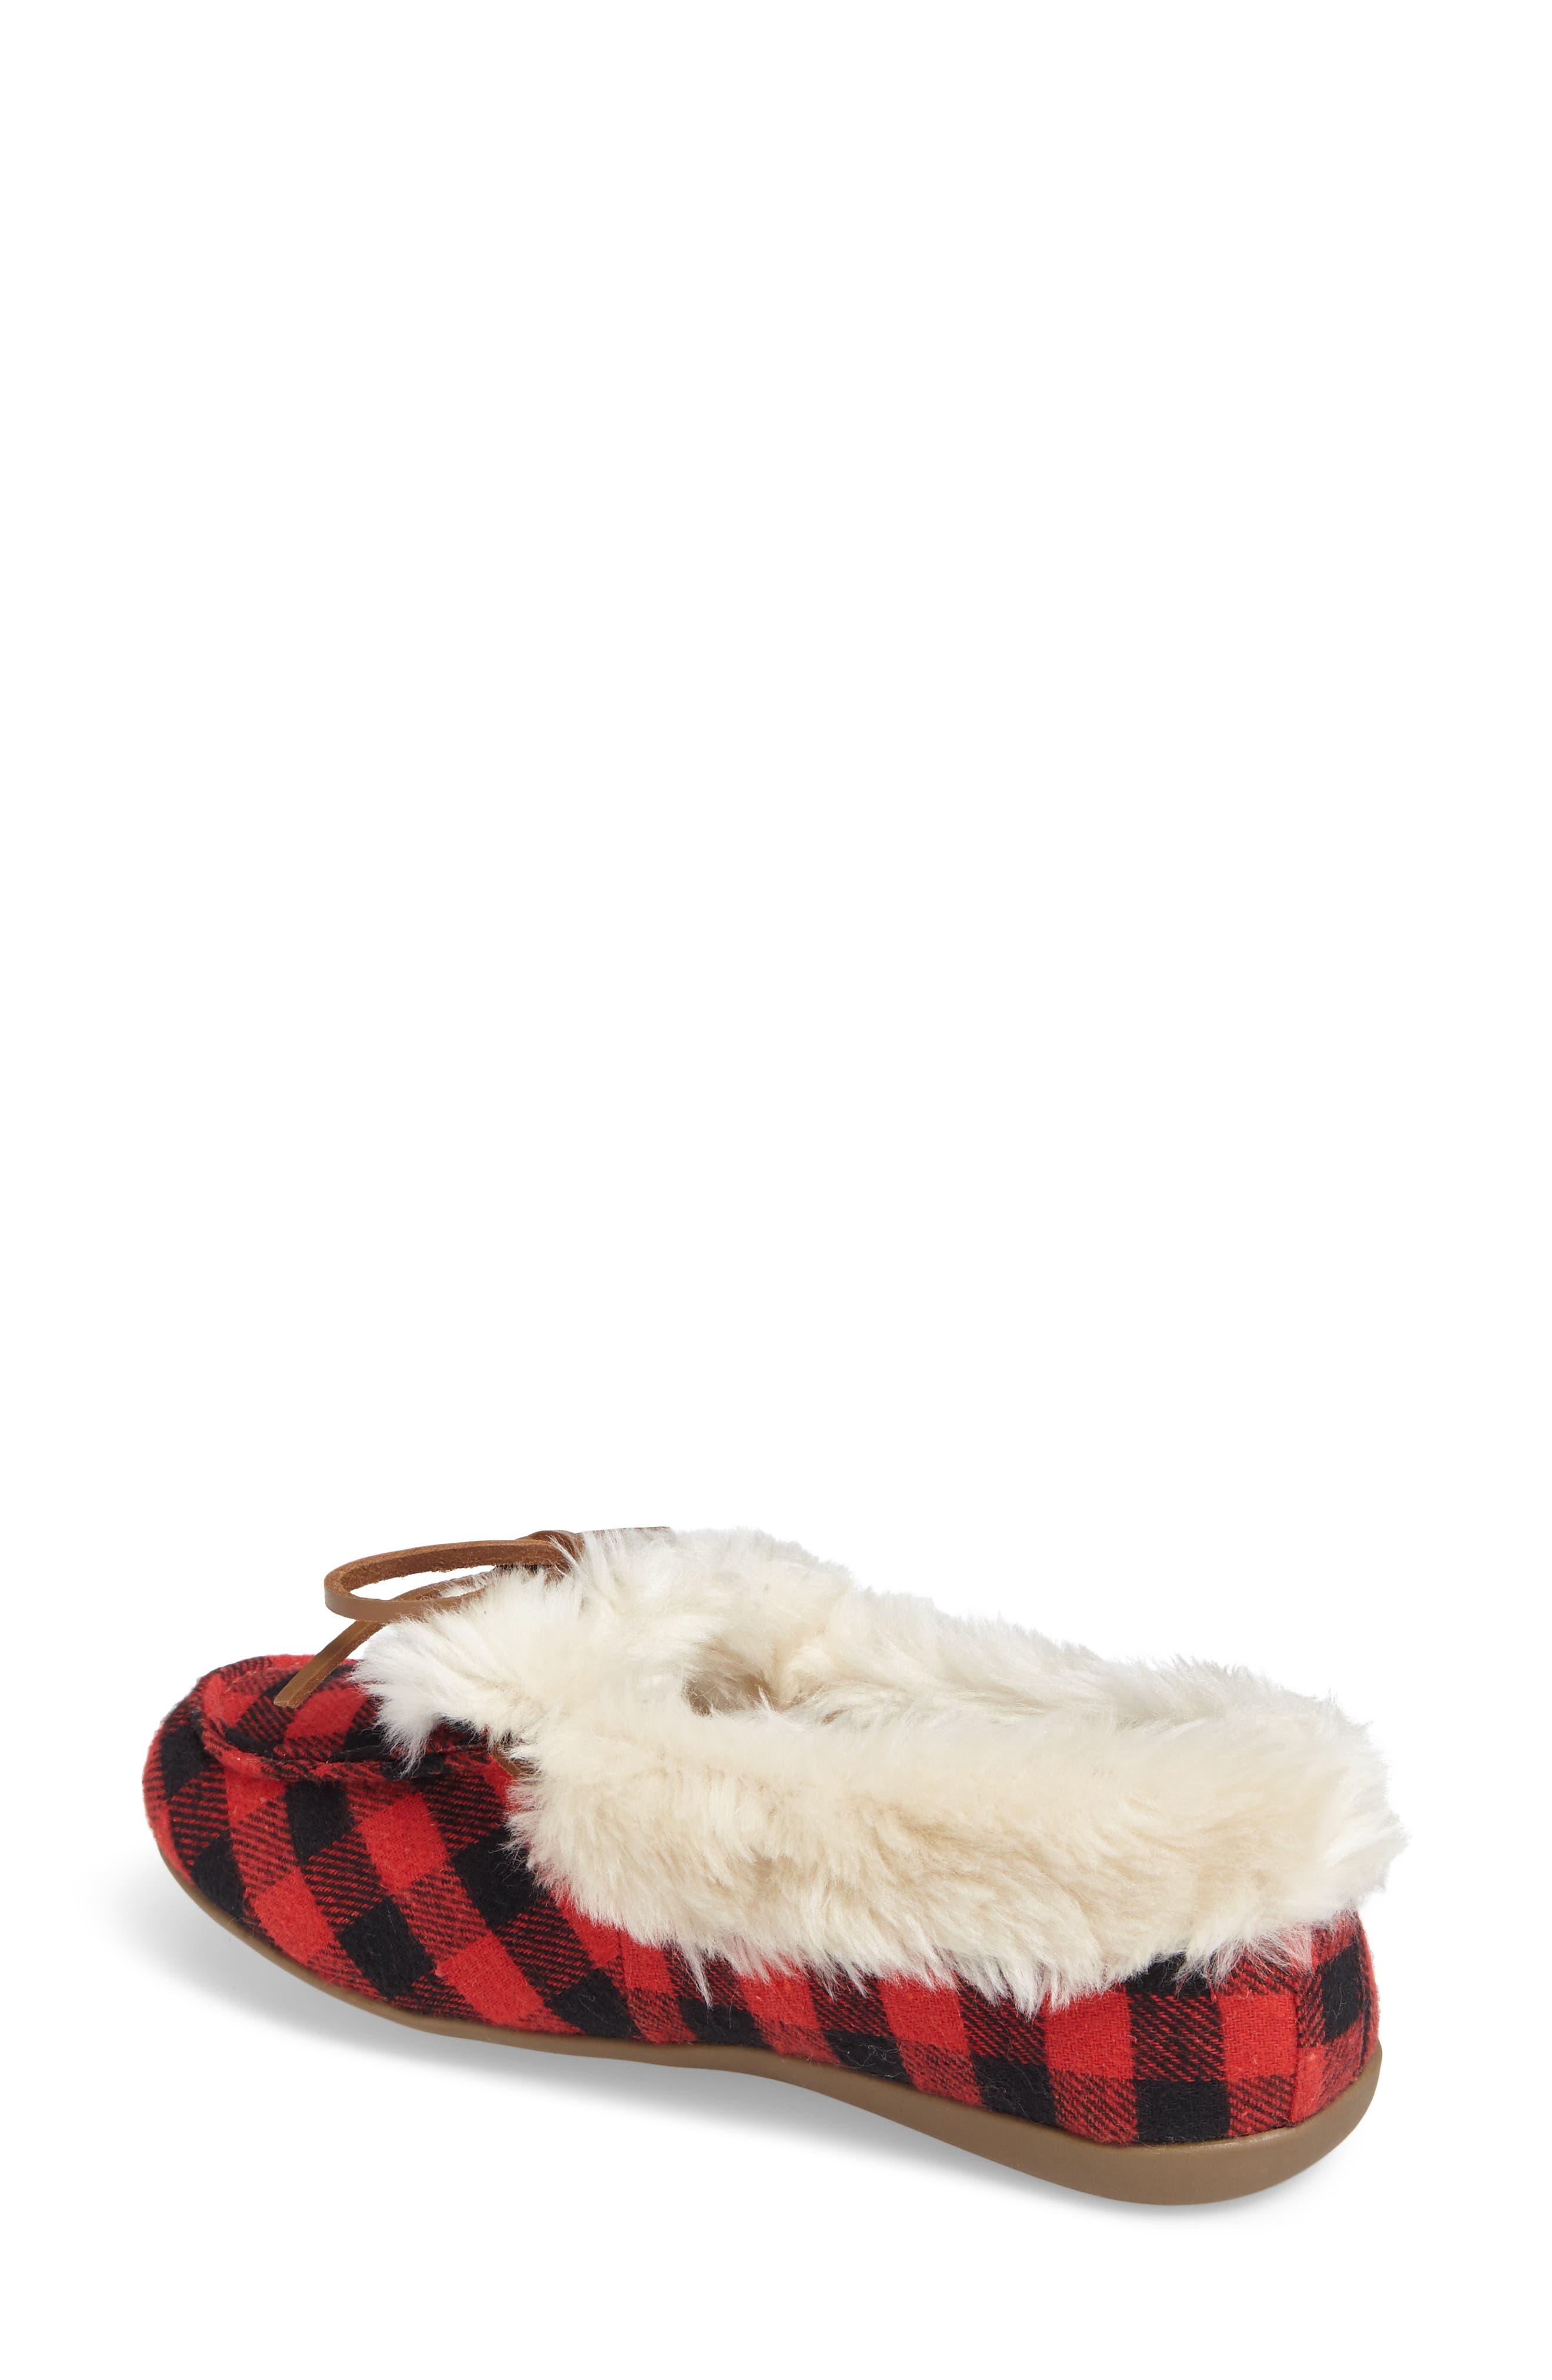 Juniper Faux Fur Slipper,                             Alternate thumbnail 2, color,                             Black Red Textile